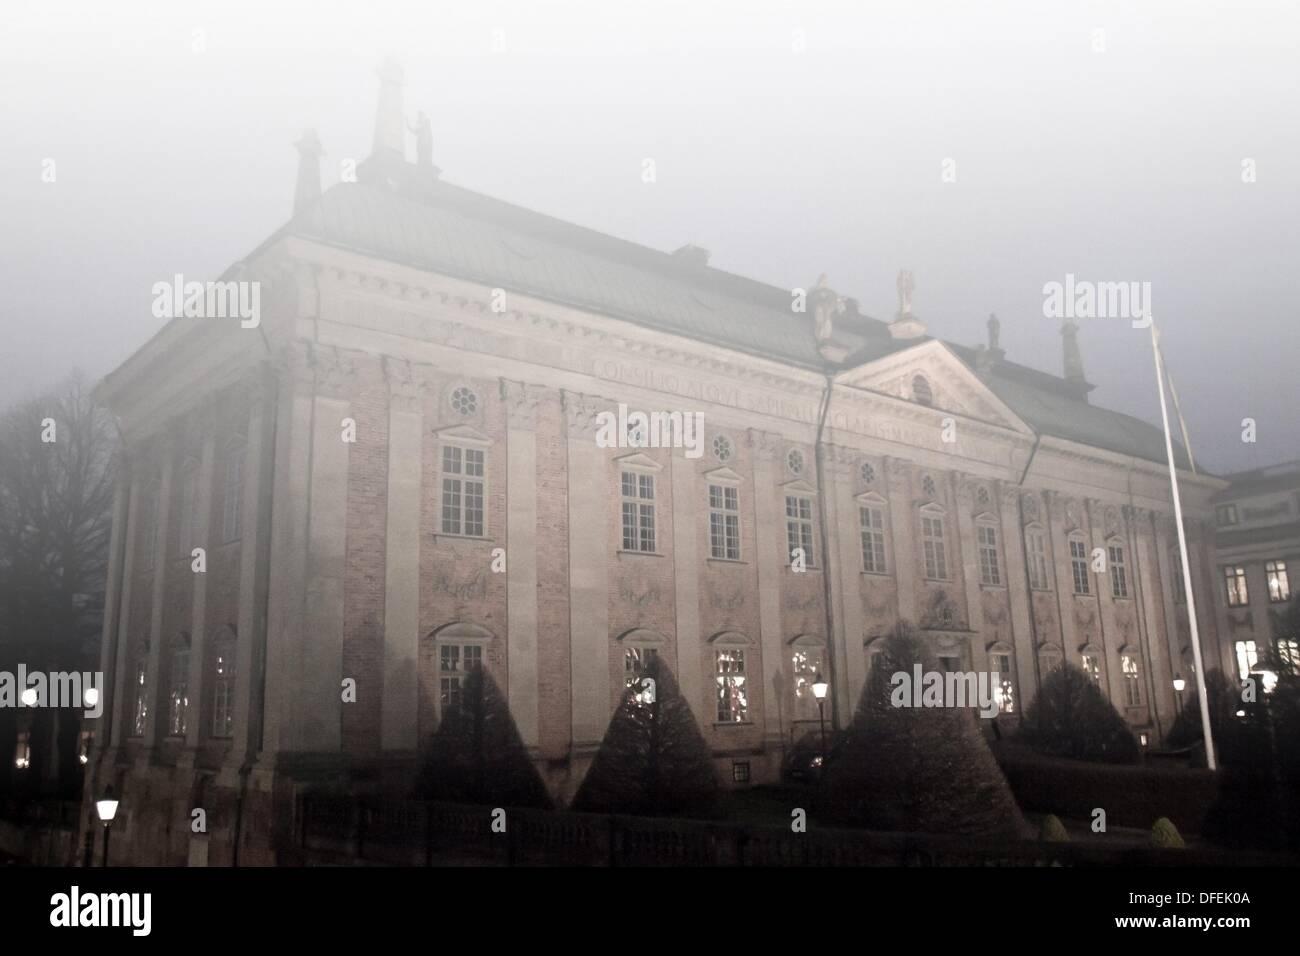 Casa svedese di nobiltà, Riddarhuset, Stoccolma, Svezia Immagini Stock